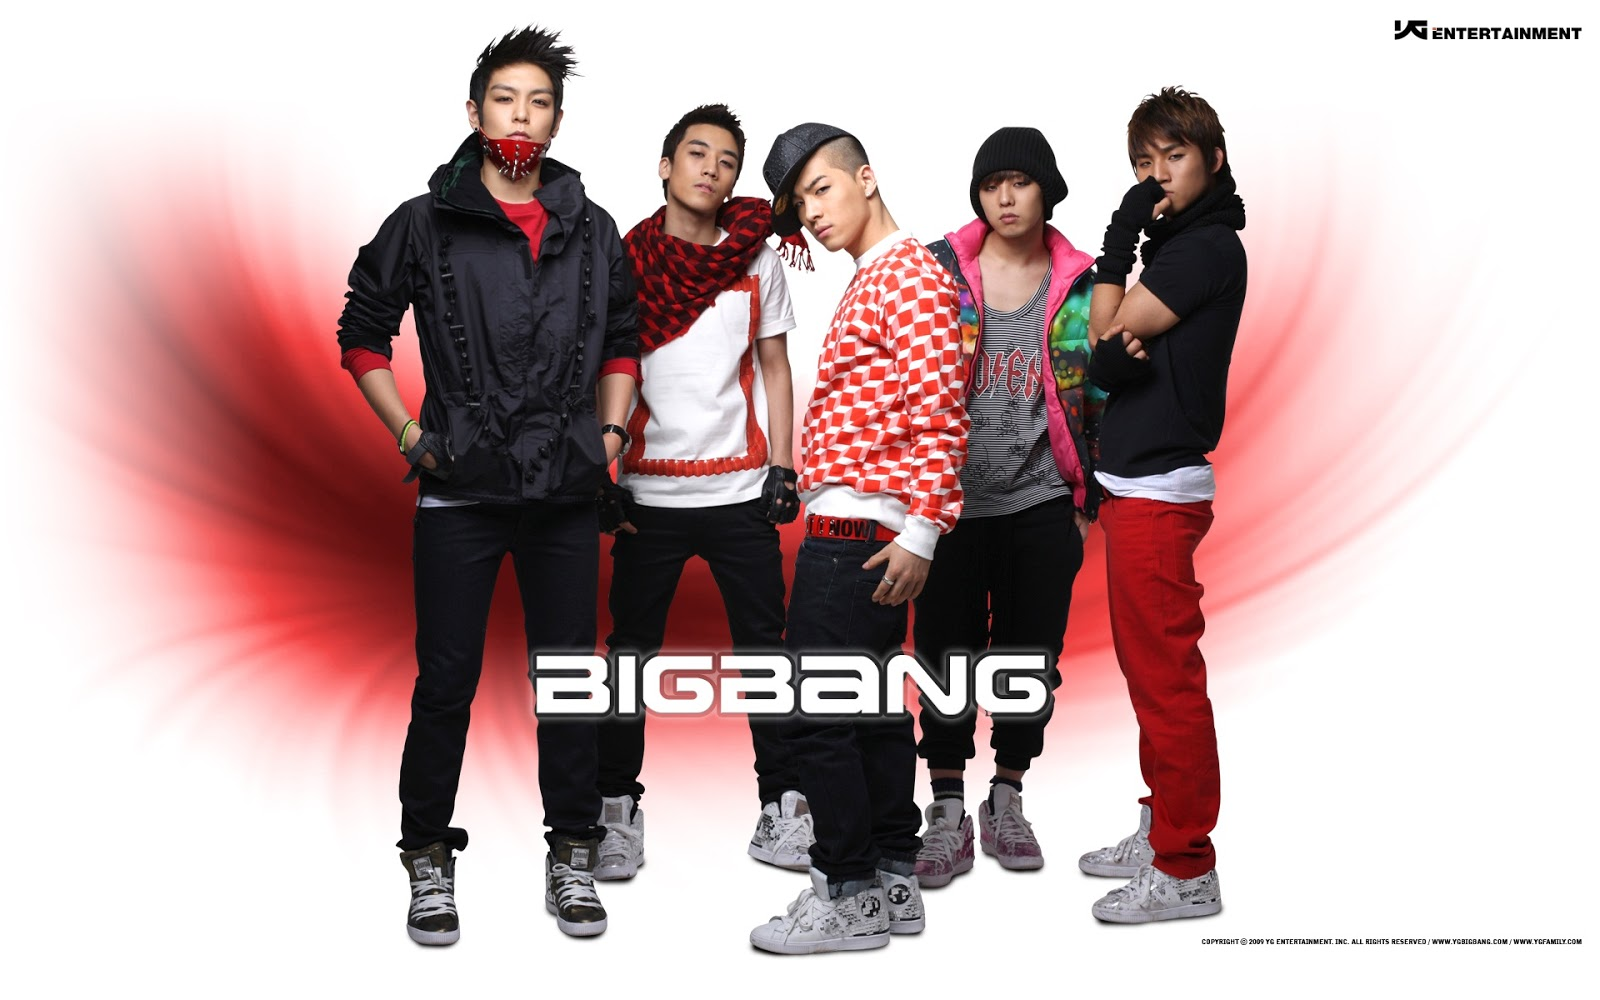 big bang 빅뱅 bigbang wallpaper hd 4 big bang 빅뱅